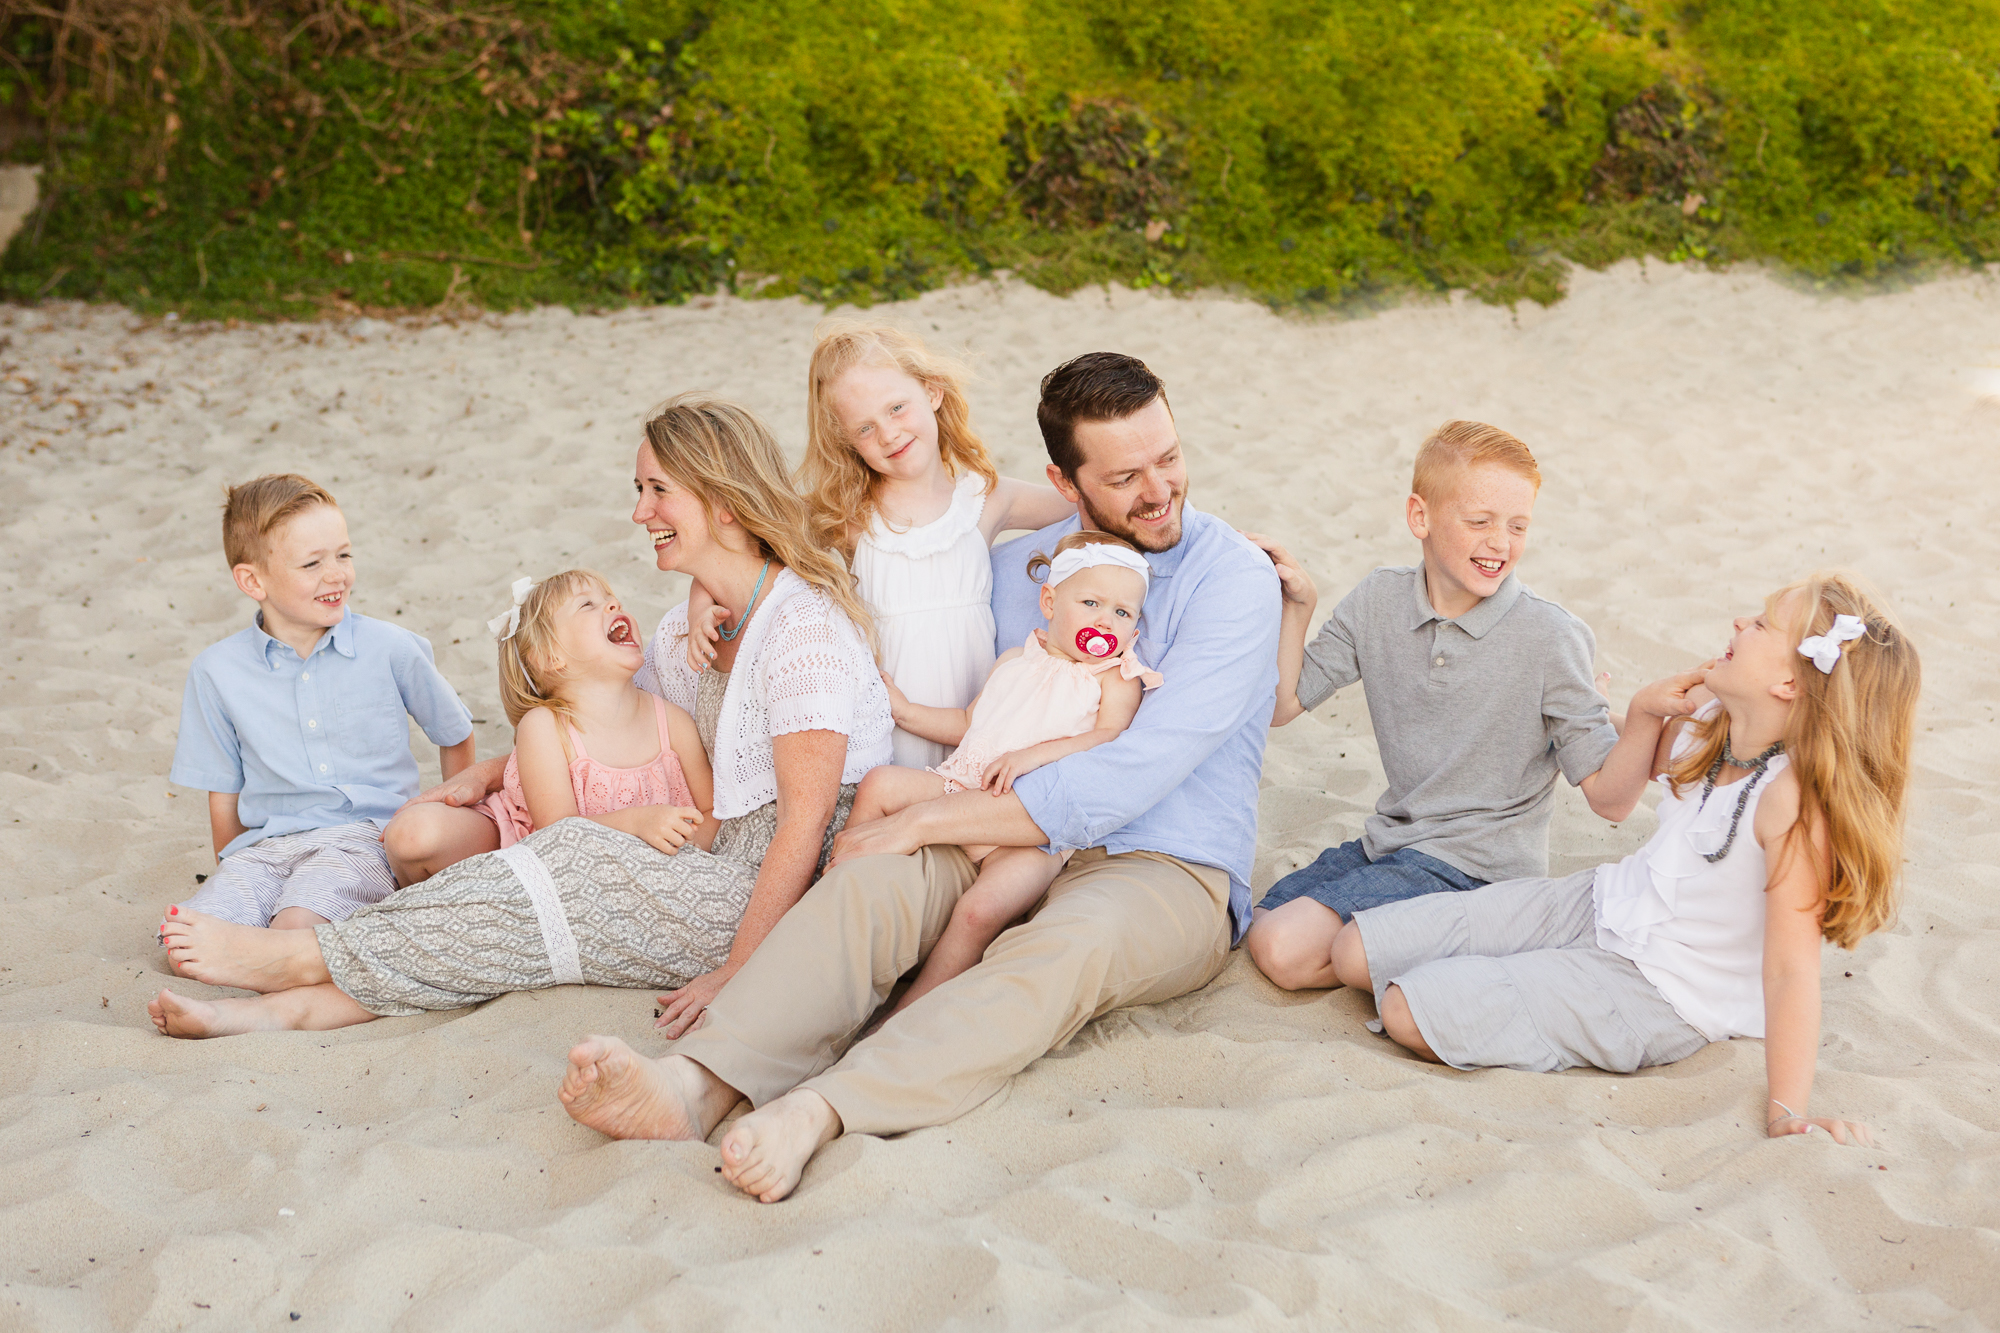 San-Diego-Family-Photographer-Christine-Dammann-Pacific-Beach-Green-6.jpg